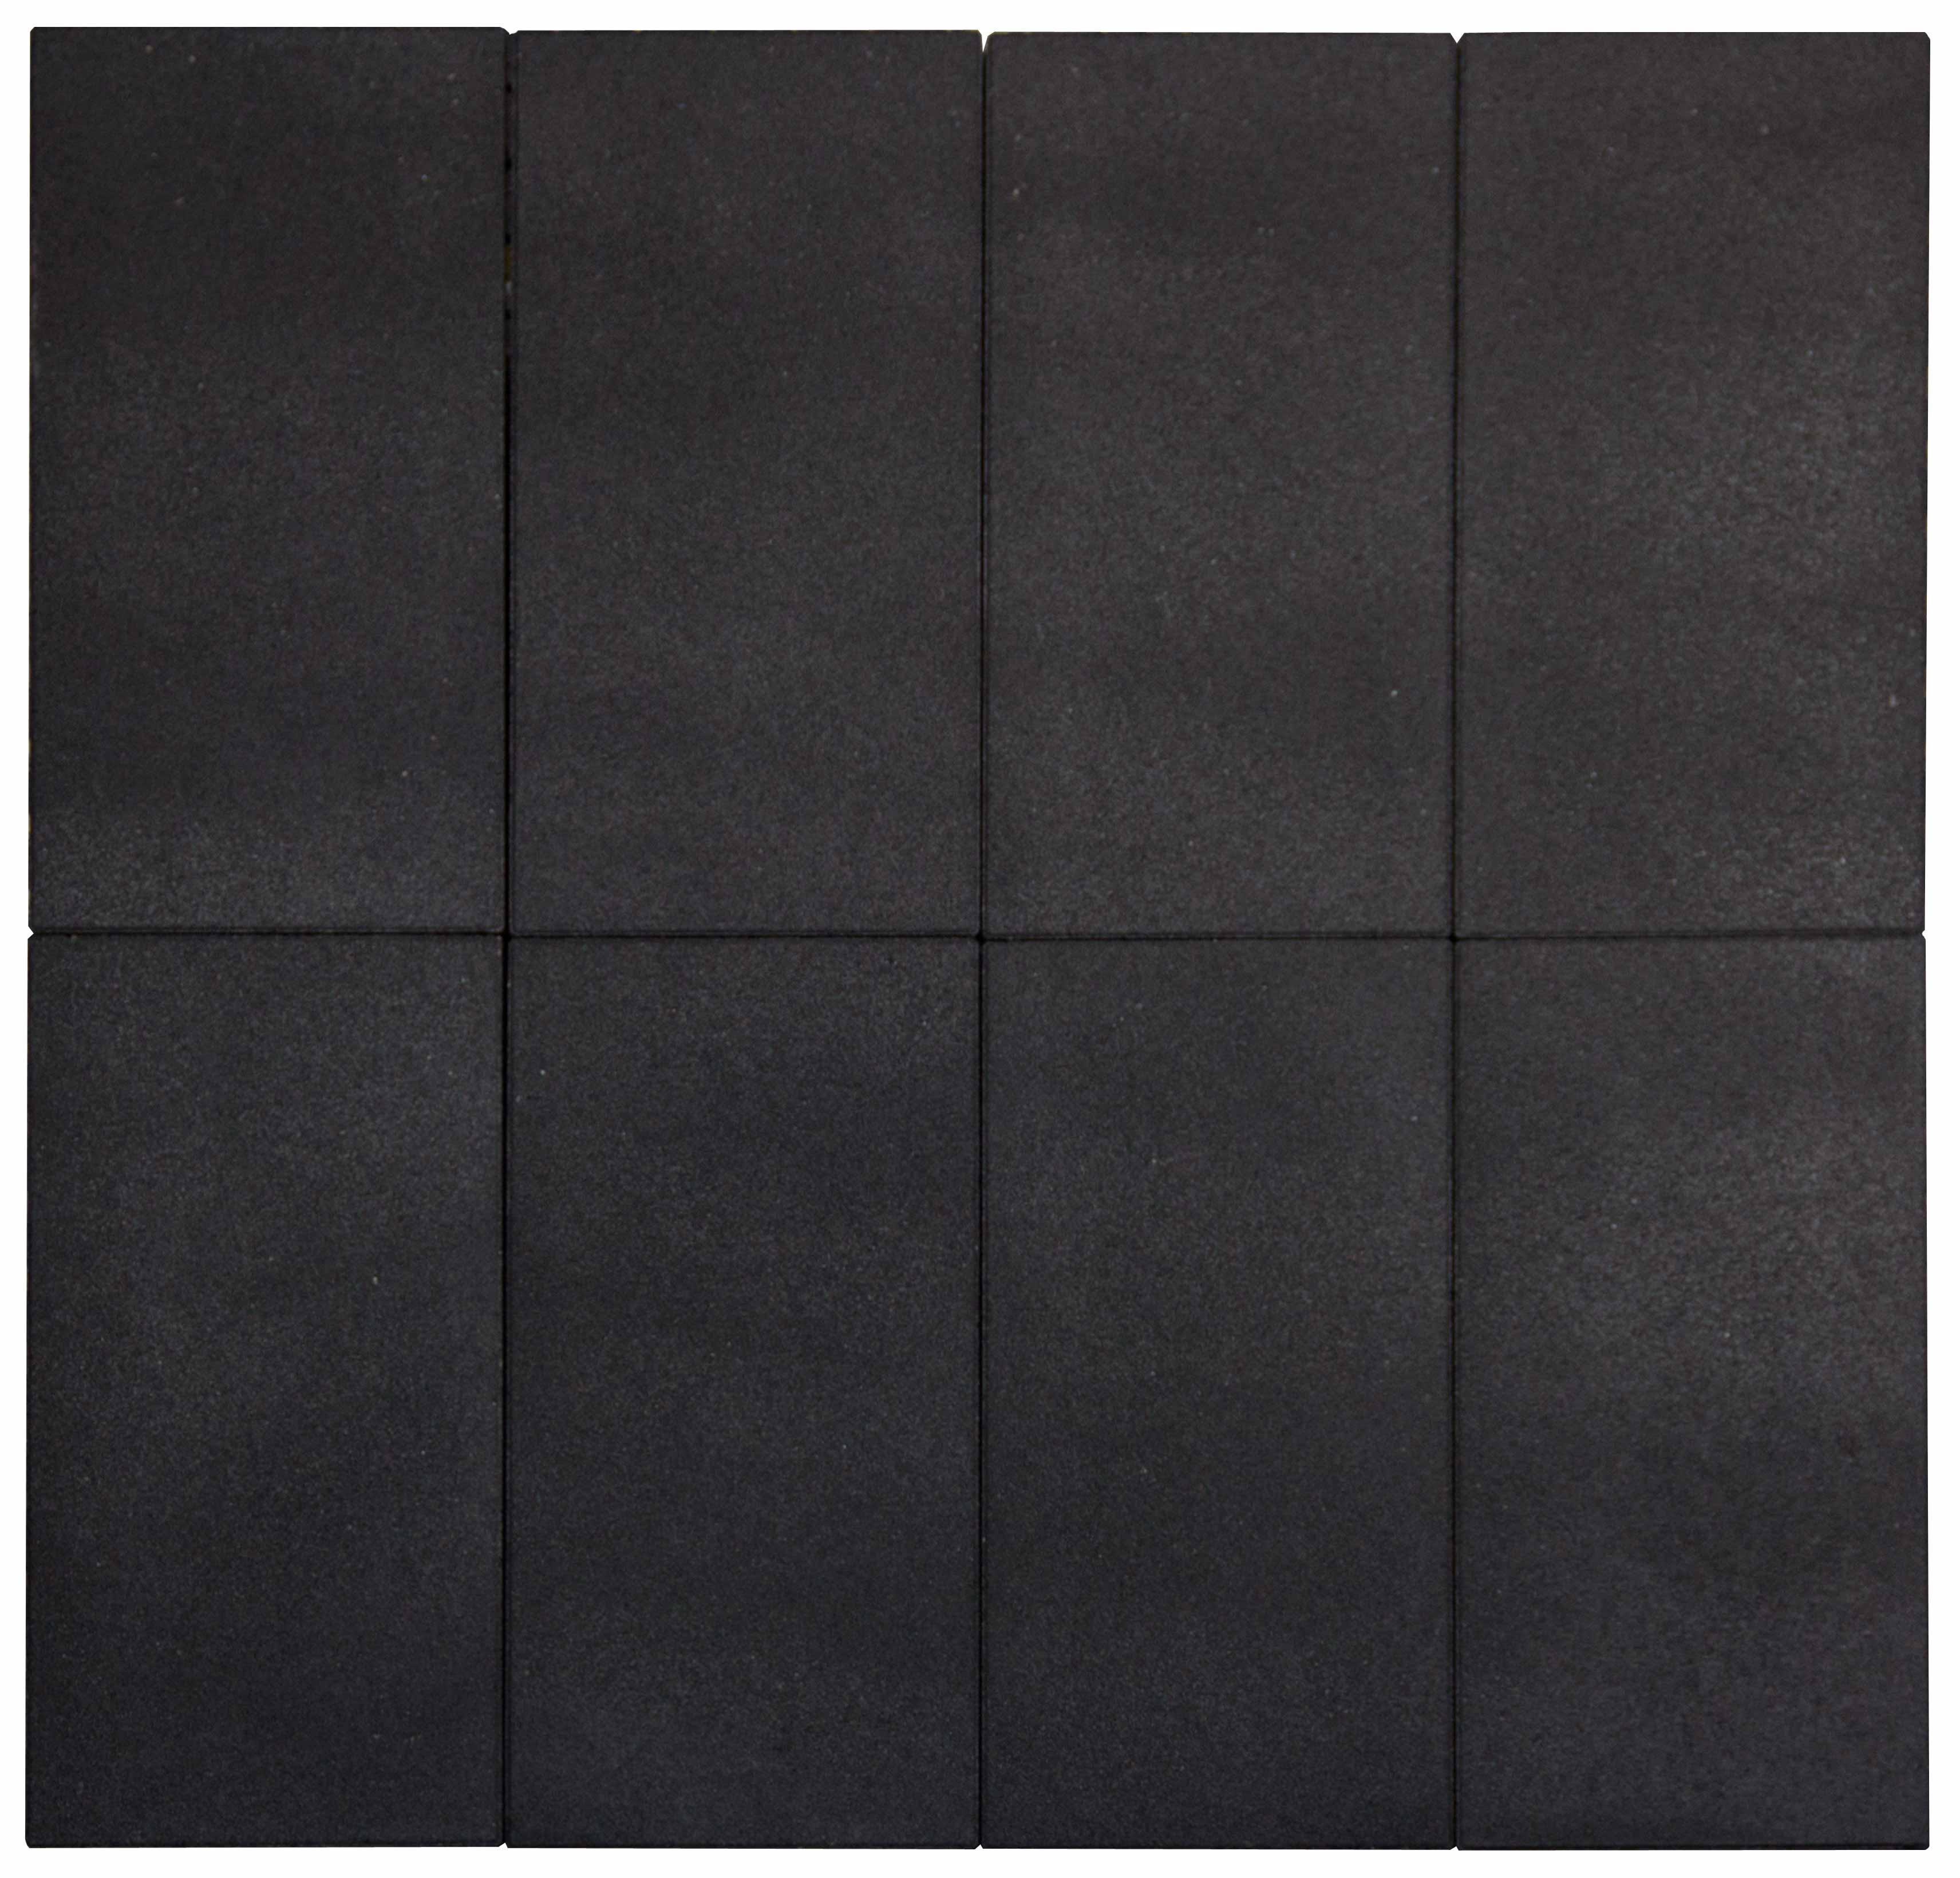 MBI | GeoTops Color 3.0 60x30x4 | Dusk Black